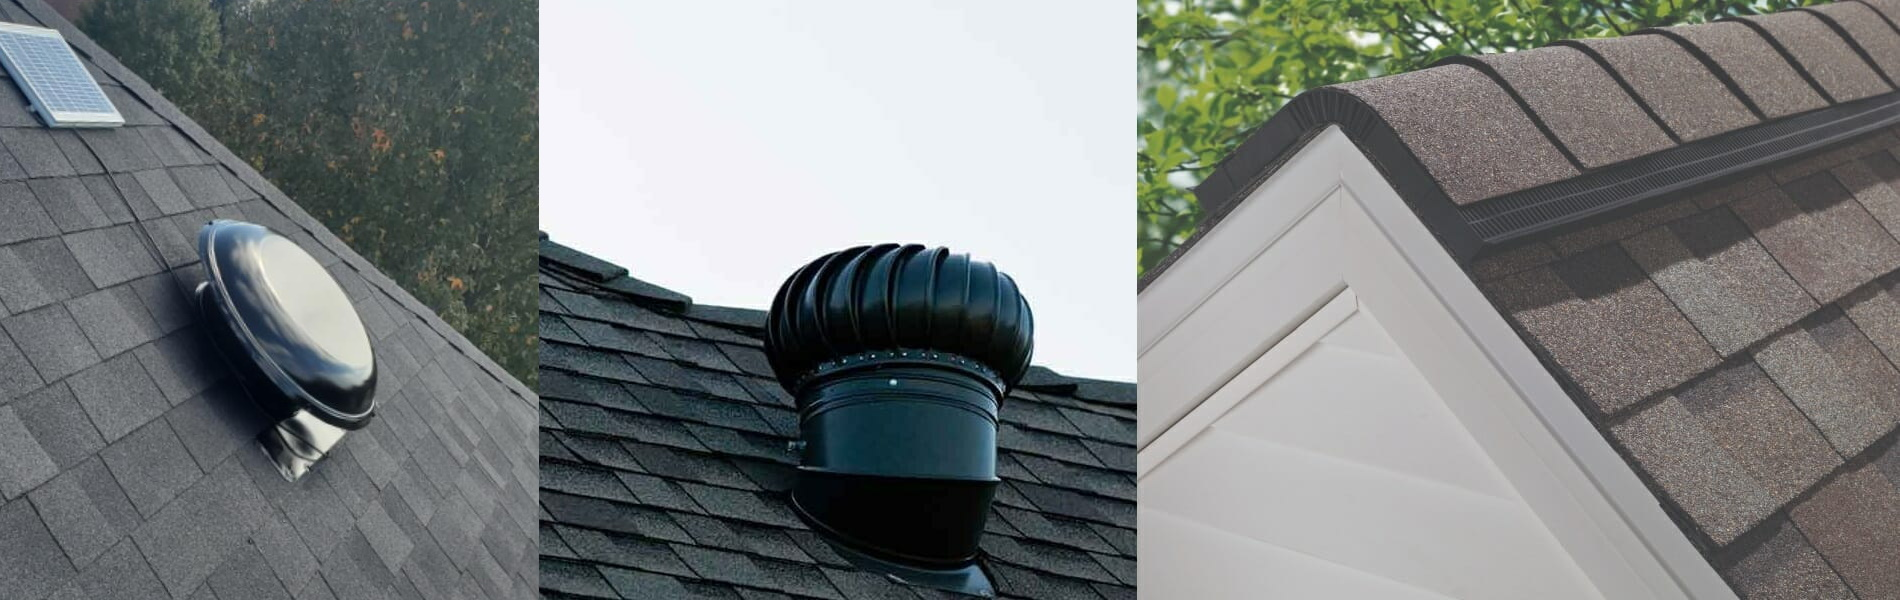 good-attic-ventilation-service-honest-roof